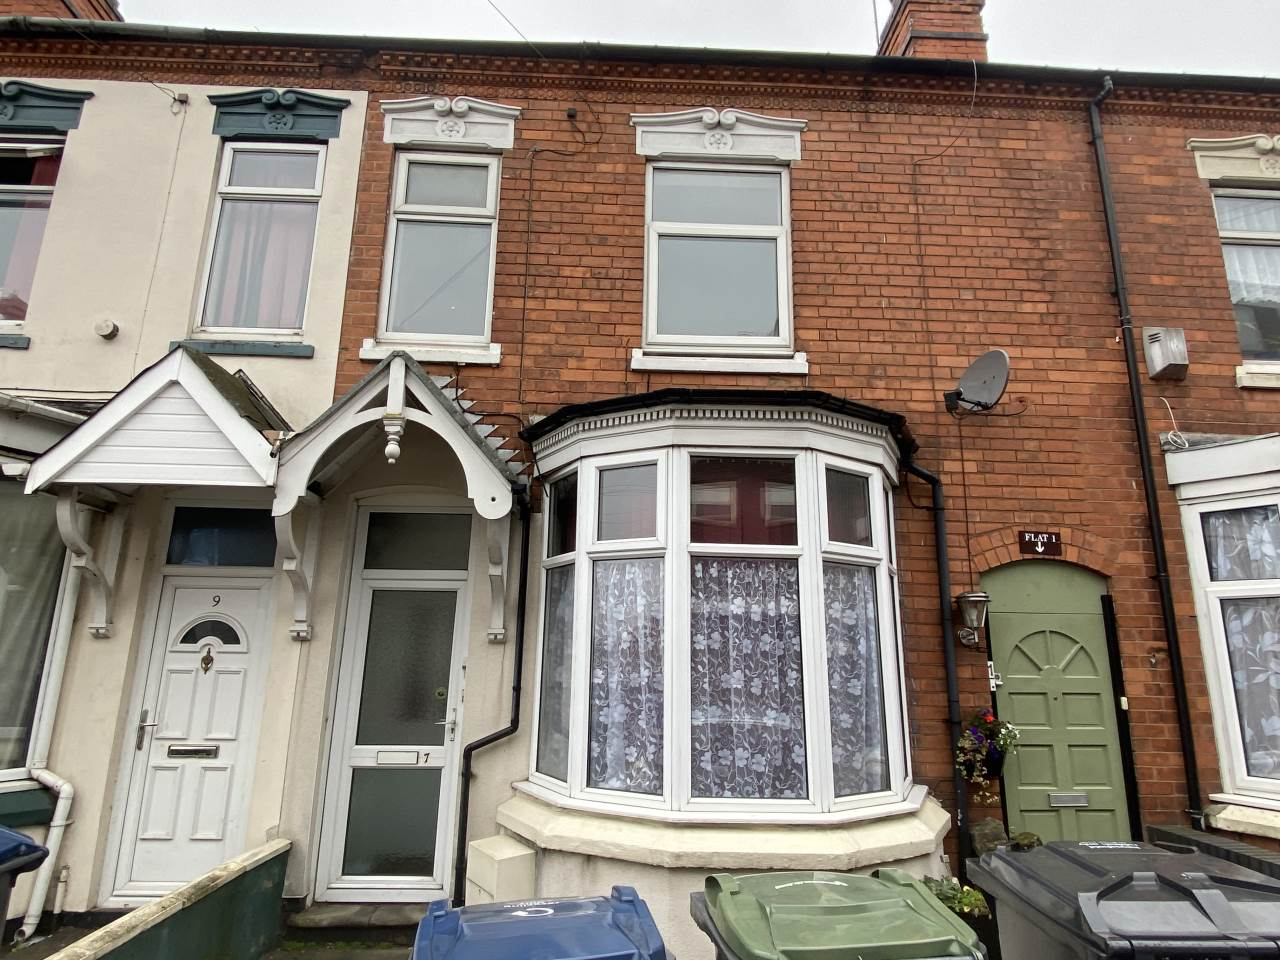 2 bed flat to rent in Newman Road, Erdington  - Property Image 1